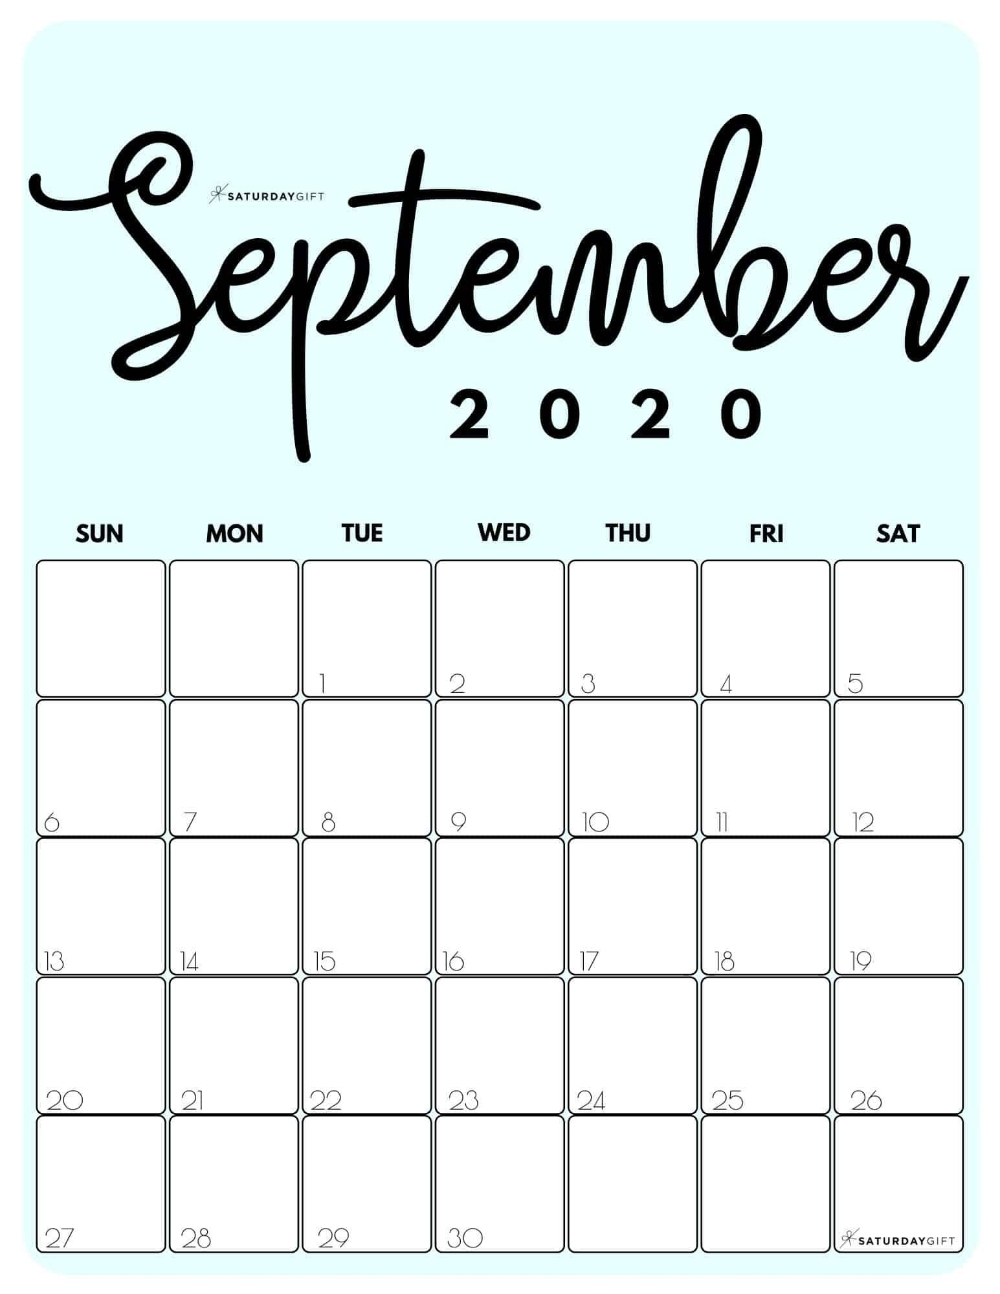 Blank September 2020 Calendar Printable - Google Search